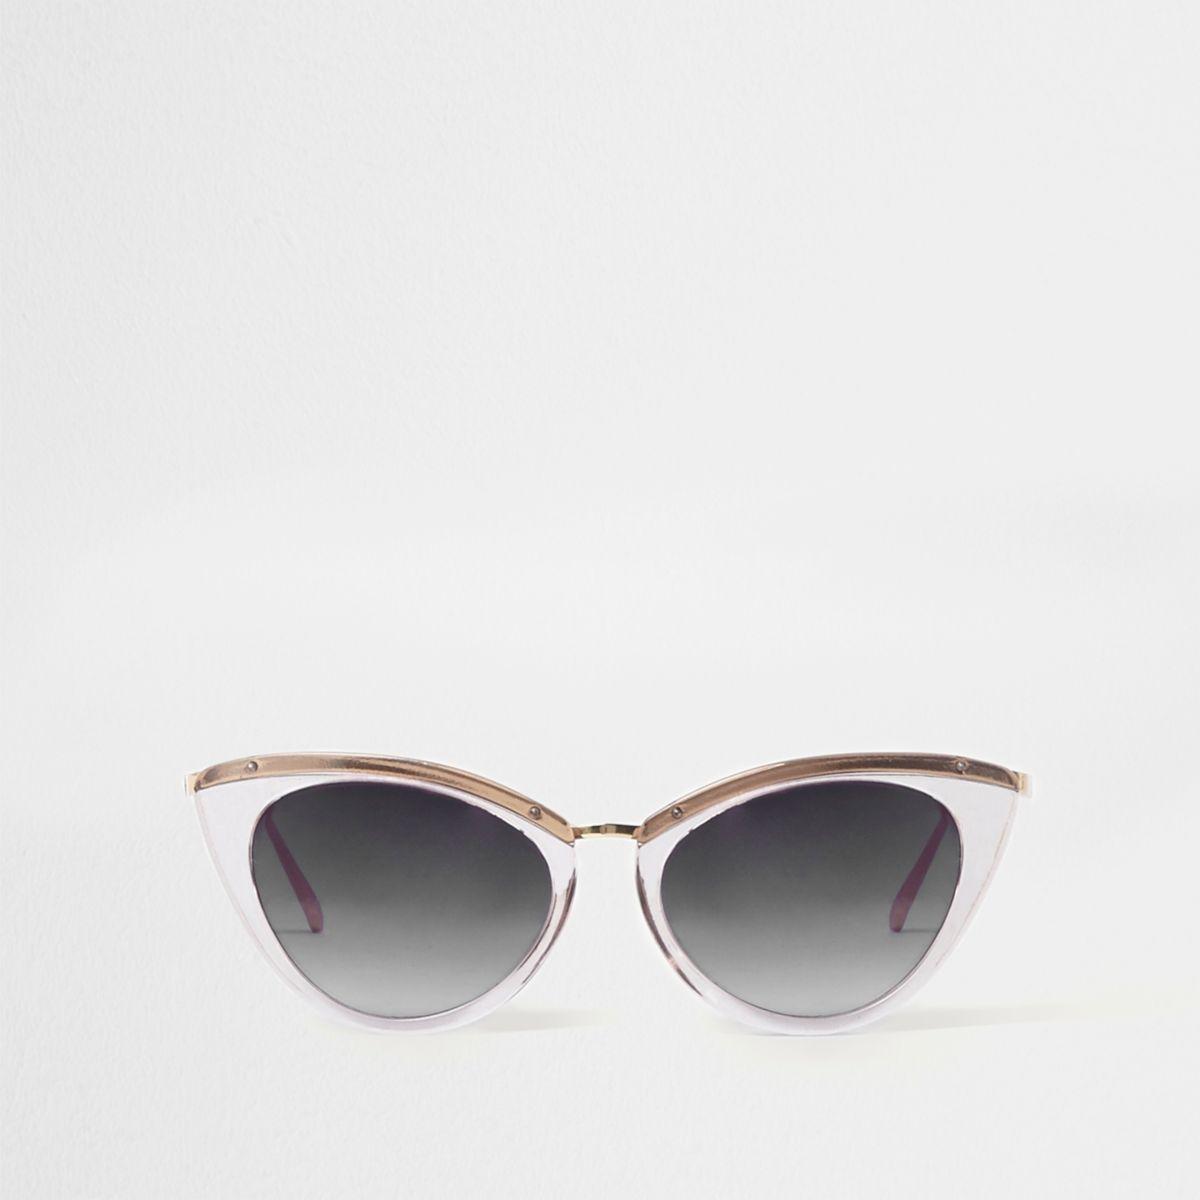 Grey cat eye smoke lens sunglasses